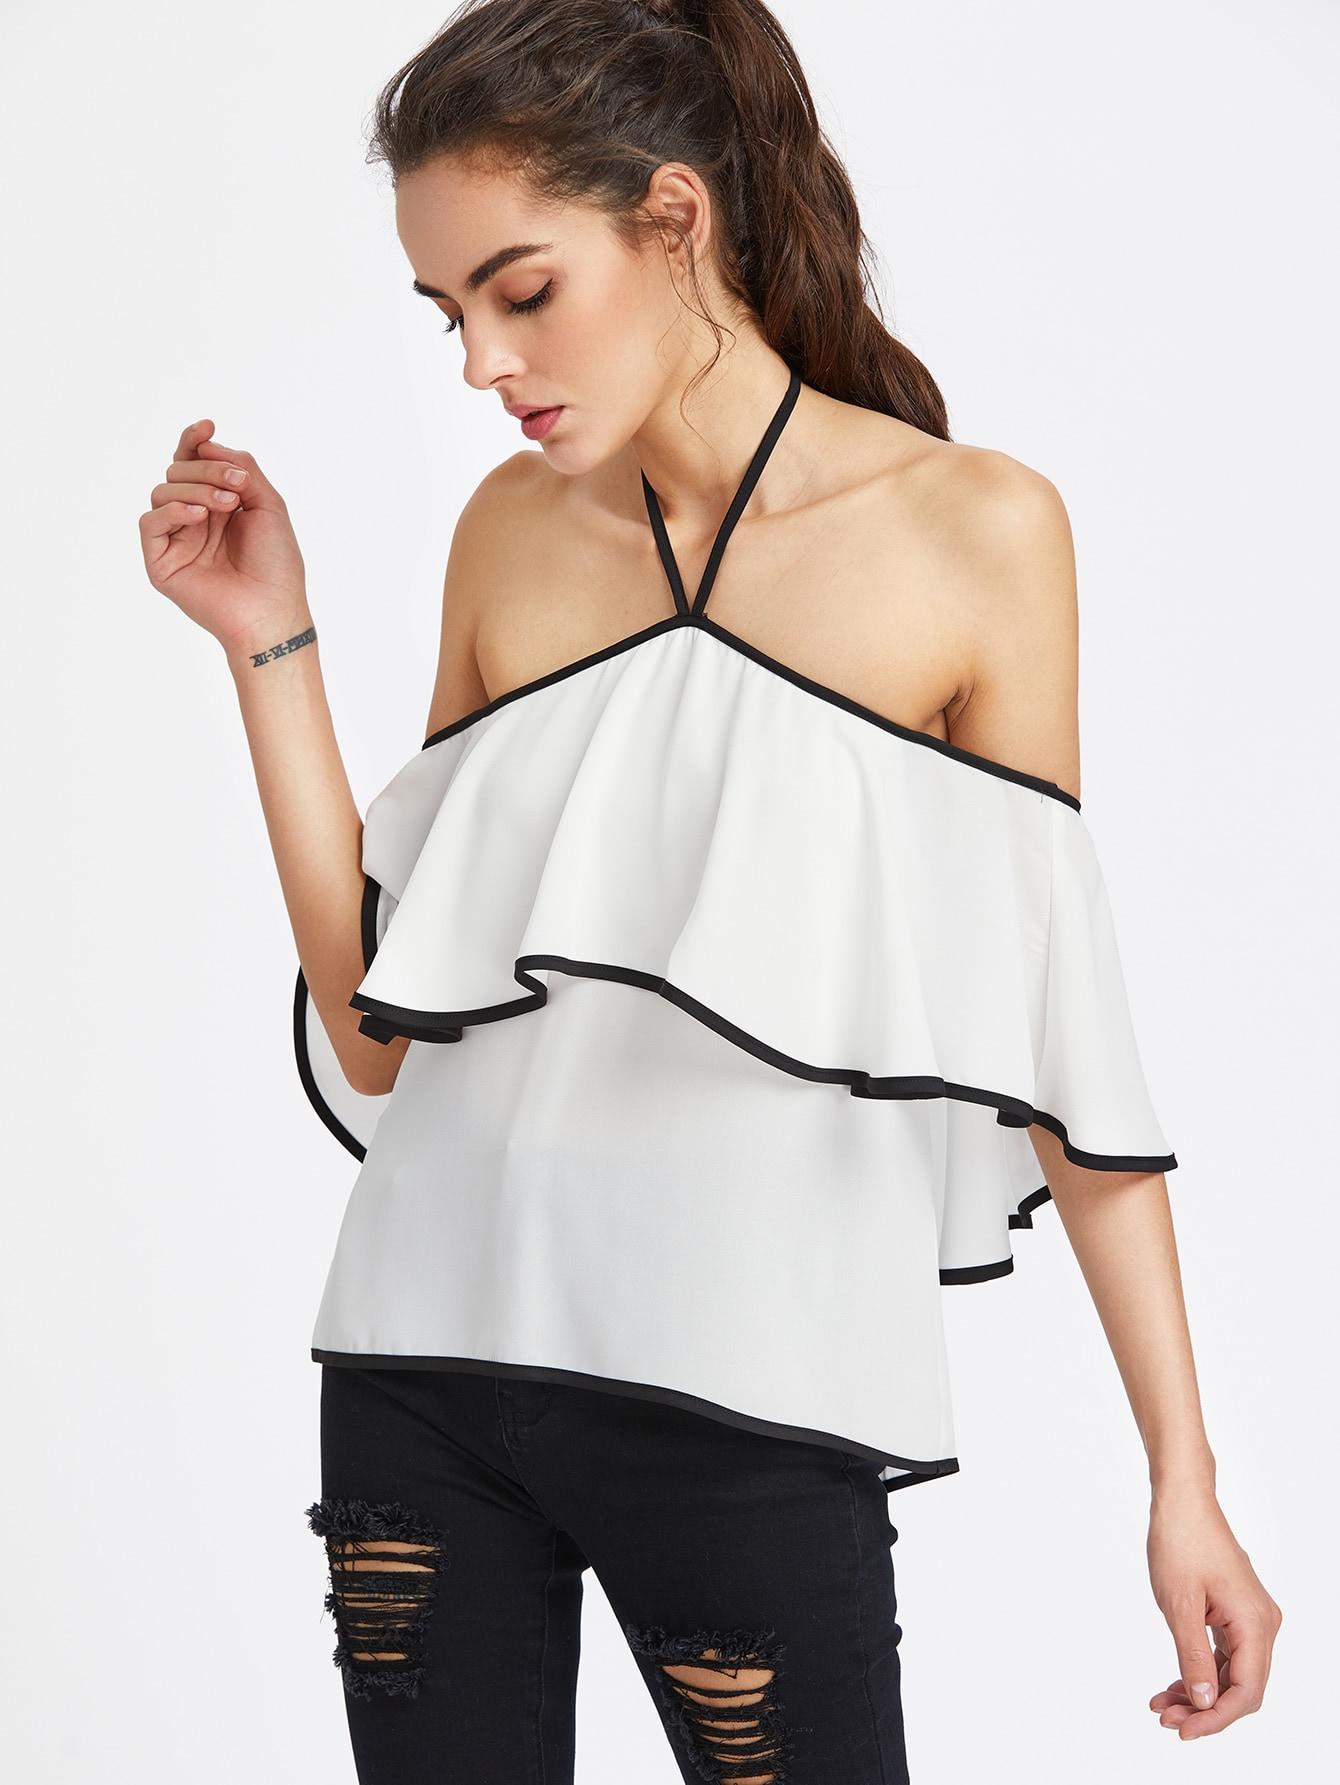 Contrast Binding Flounce Halter Bardot Top blouse170421702